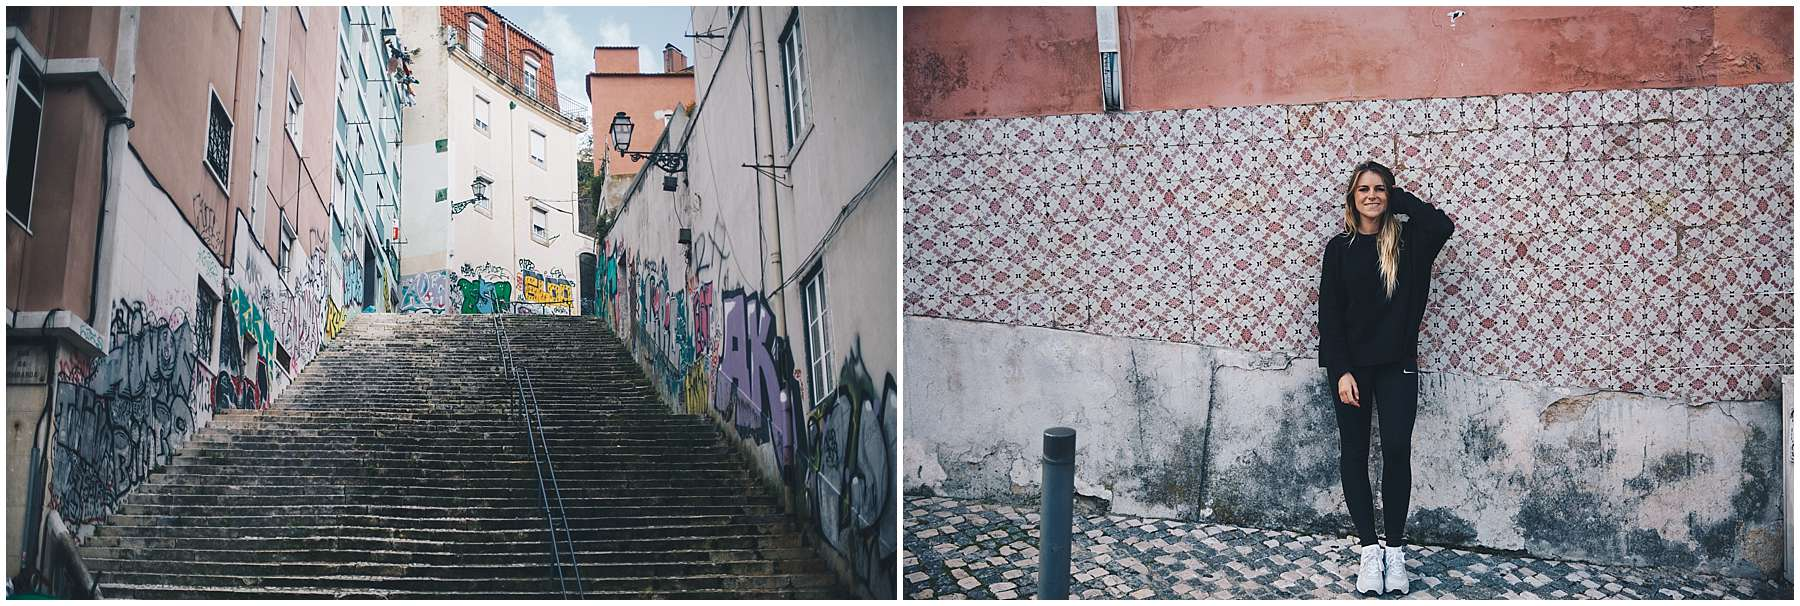 Portugal Lisbon_0006.jpg